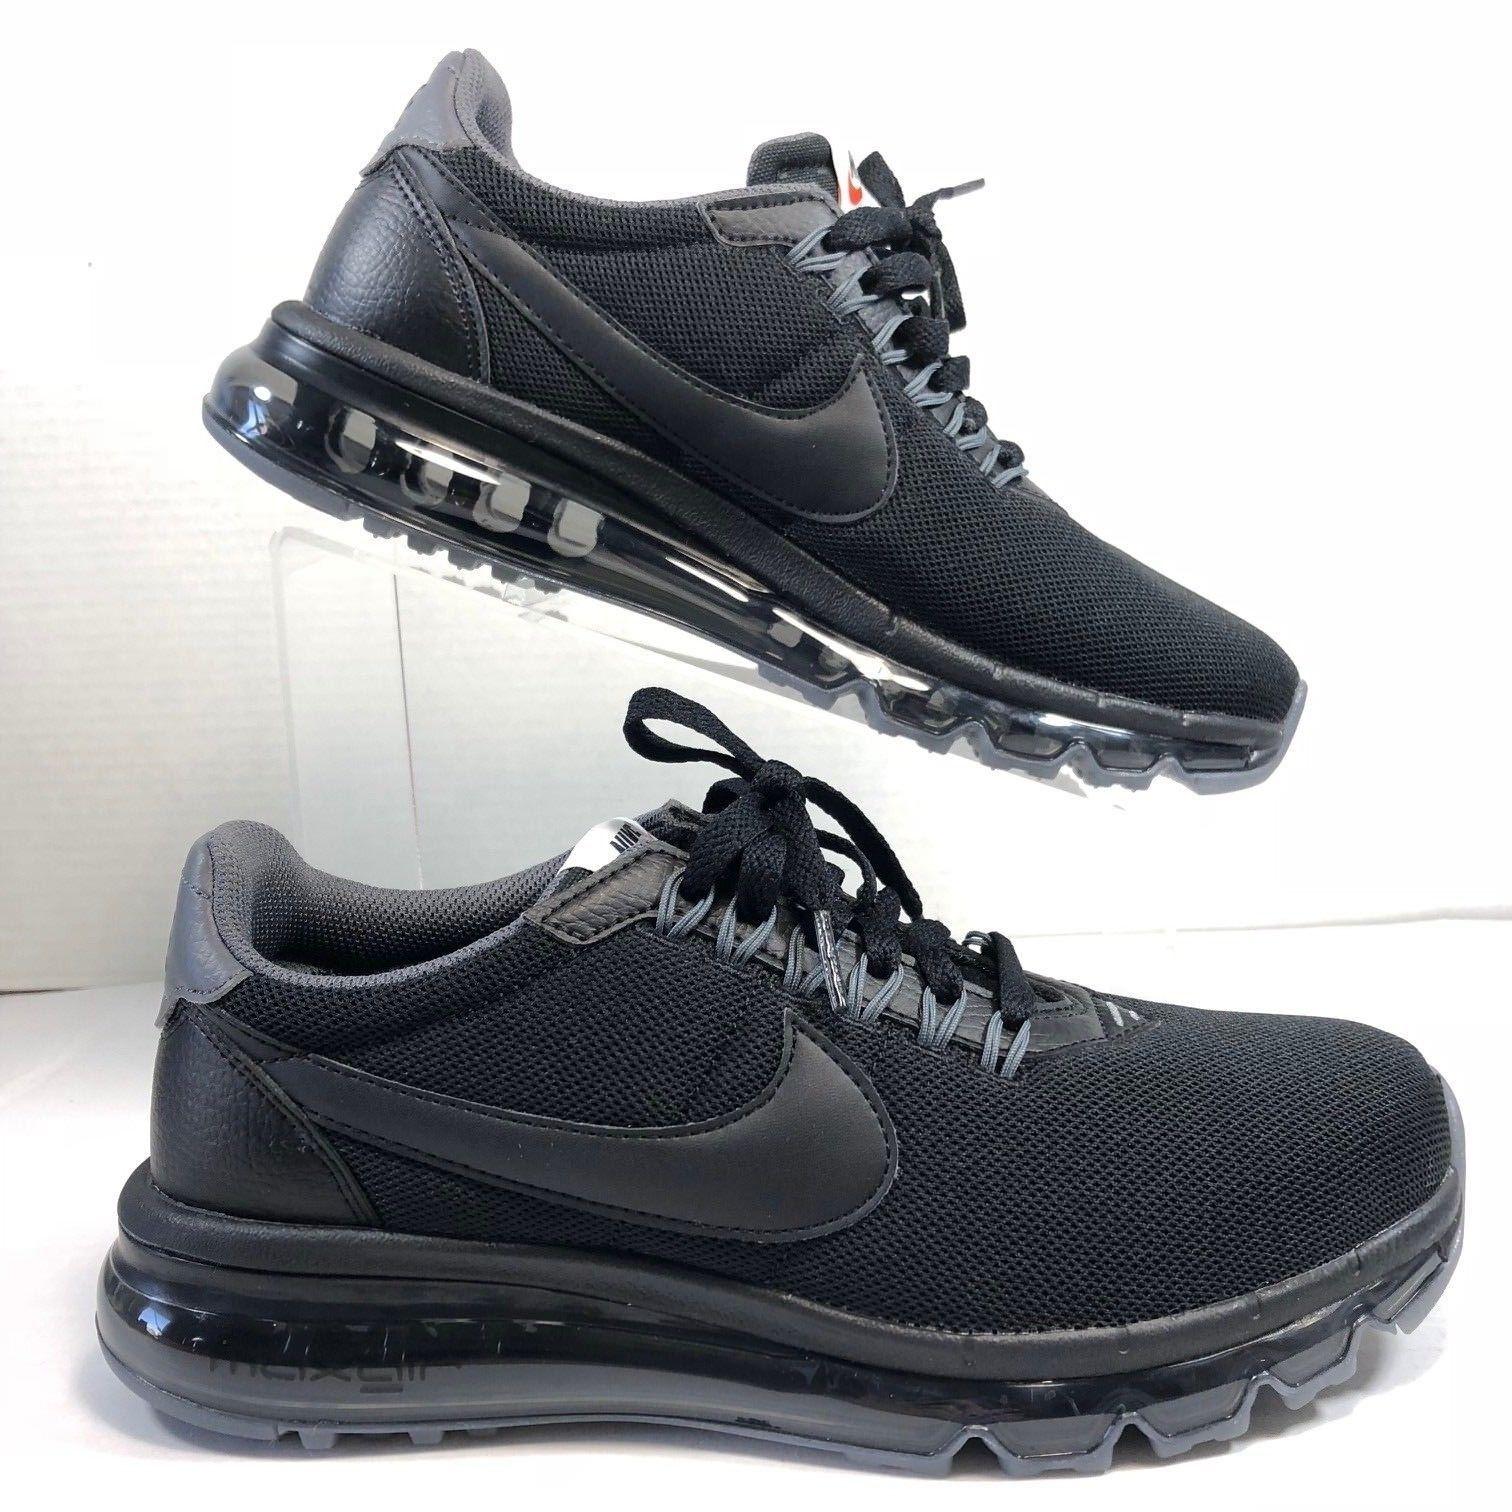 Nike Air Max Running Shoes LD Zero 2017 Women's Black 896495 002 Rare Size 5